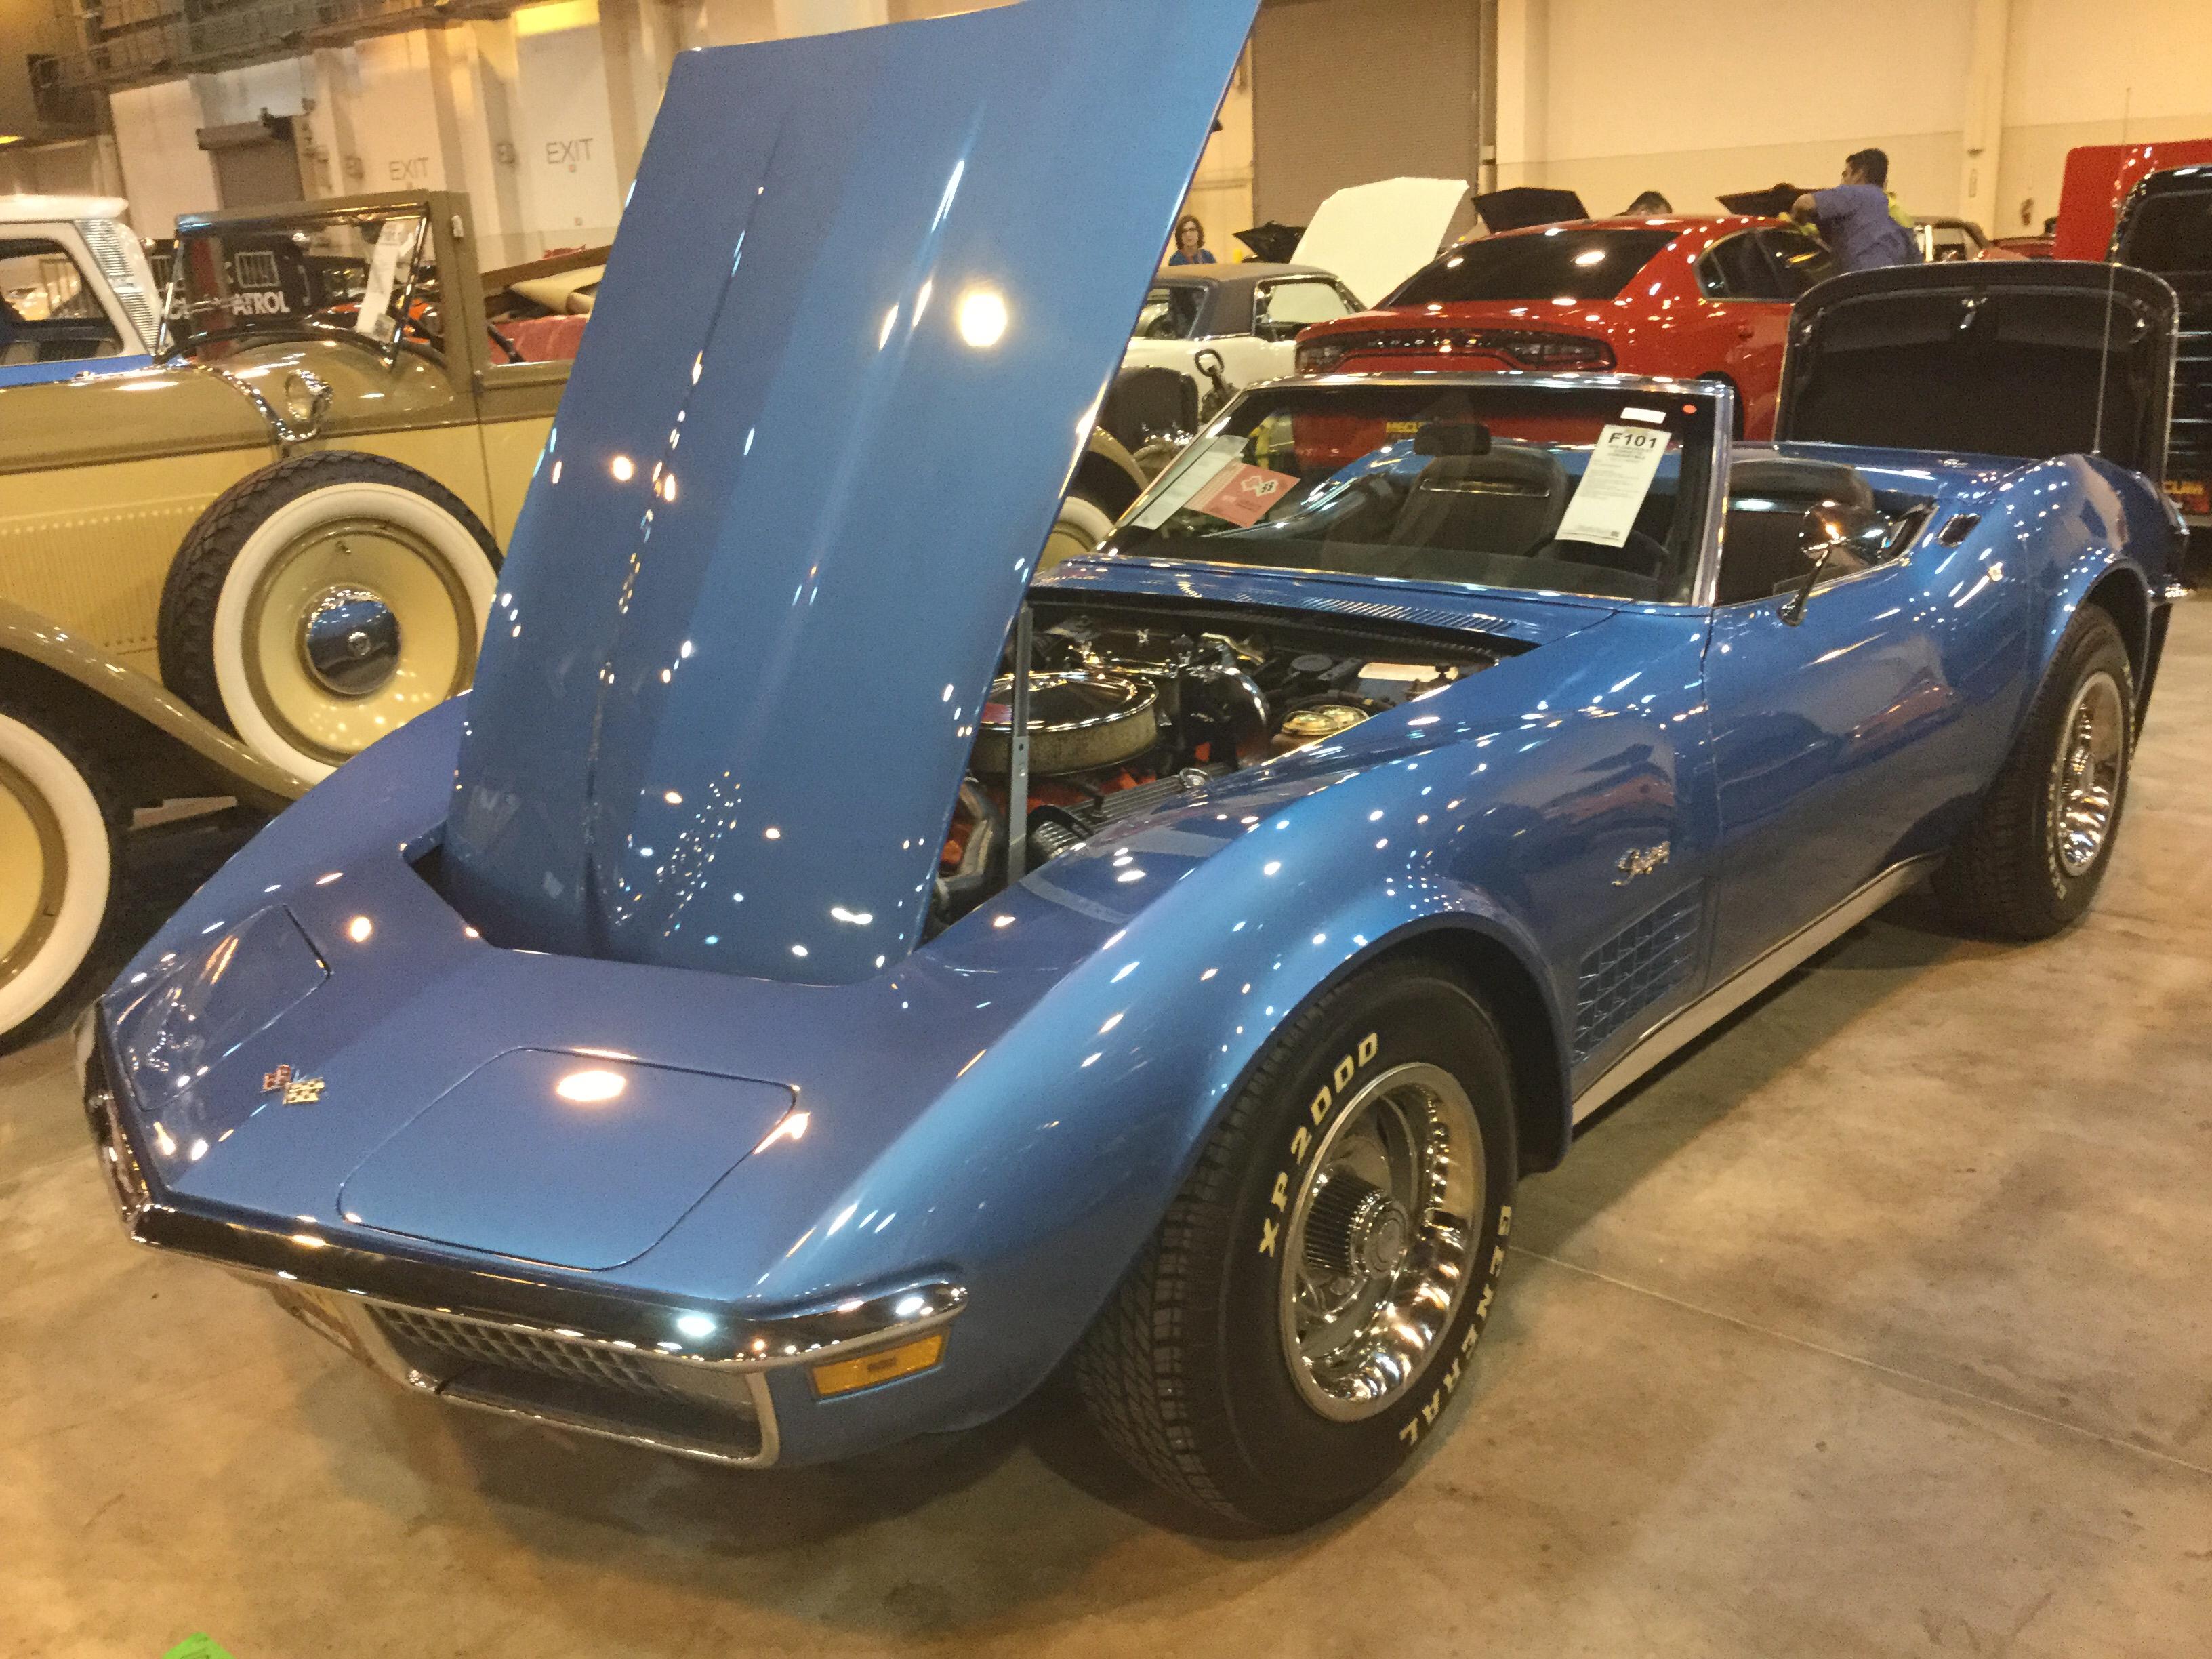 1970 Corvette For Sale >> 1970 Chevrolet Corvette Values Hagerty Valuation Tool